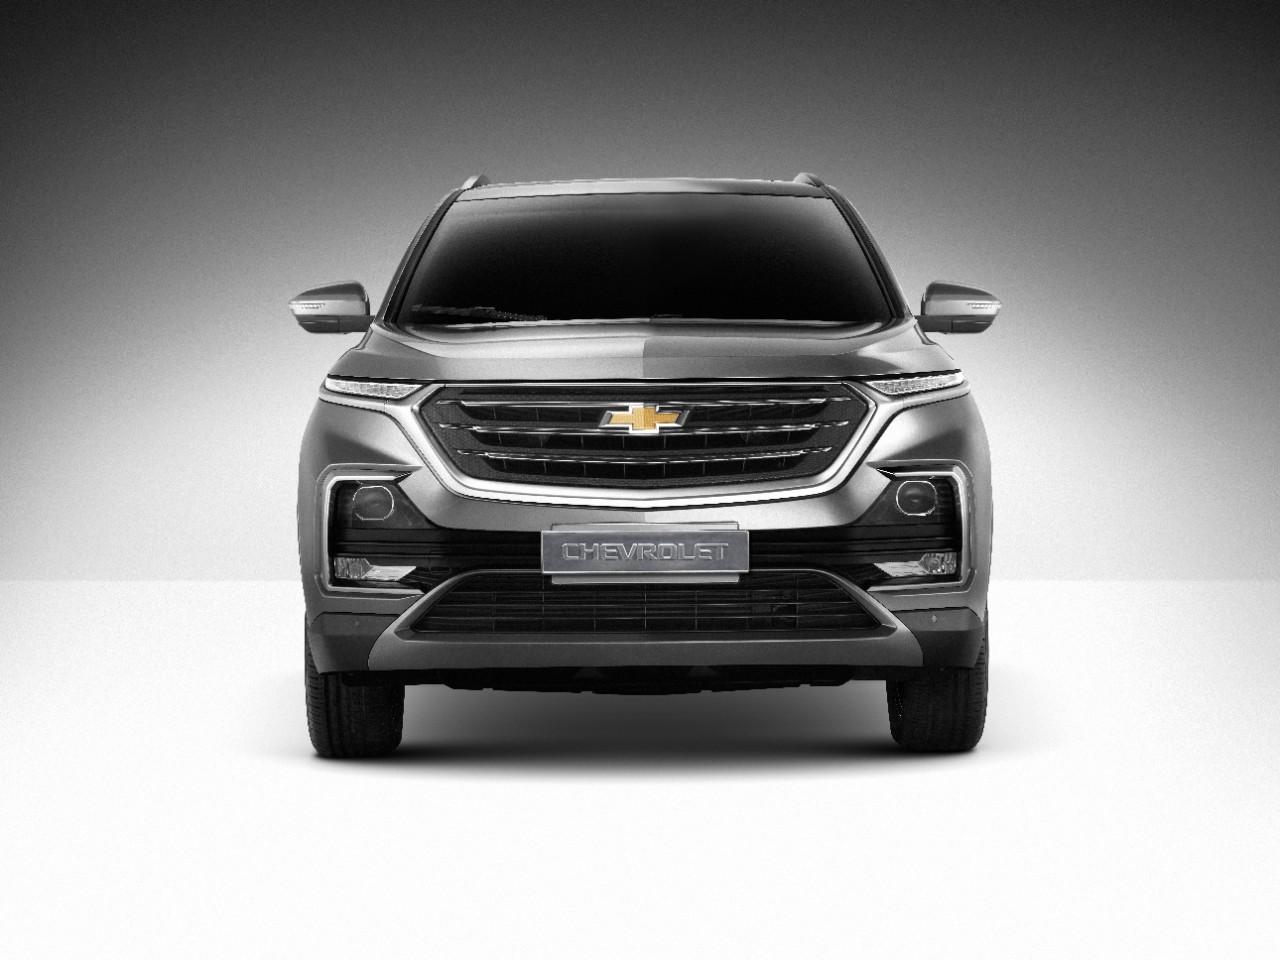 Kelebihan Chevrolet Captiva 2018 Harga